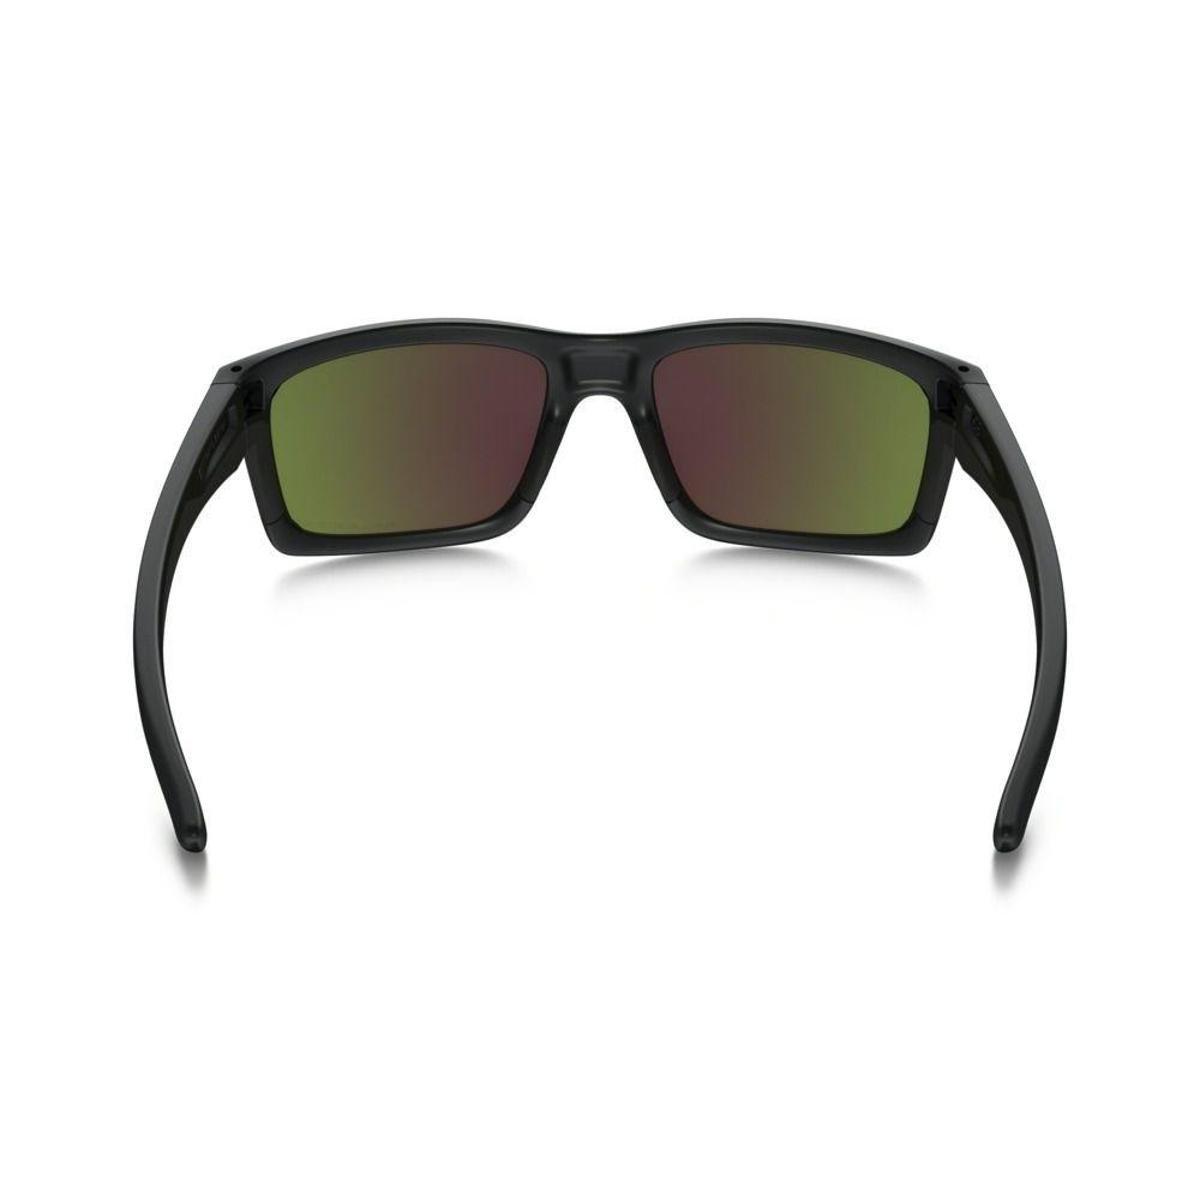 fdbf4d491c1a6 Óculos Oakley Matte Black W Ruby Iridium Polarized - Preto - Compre ...